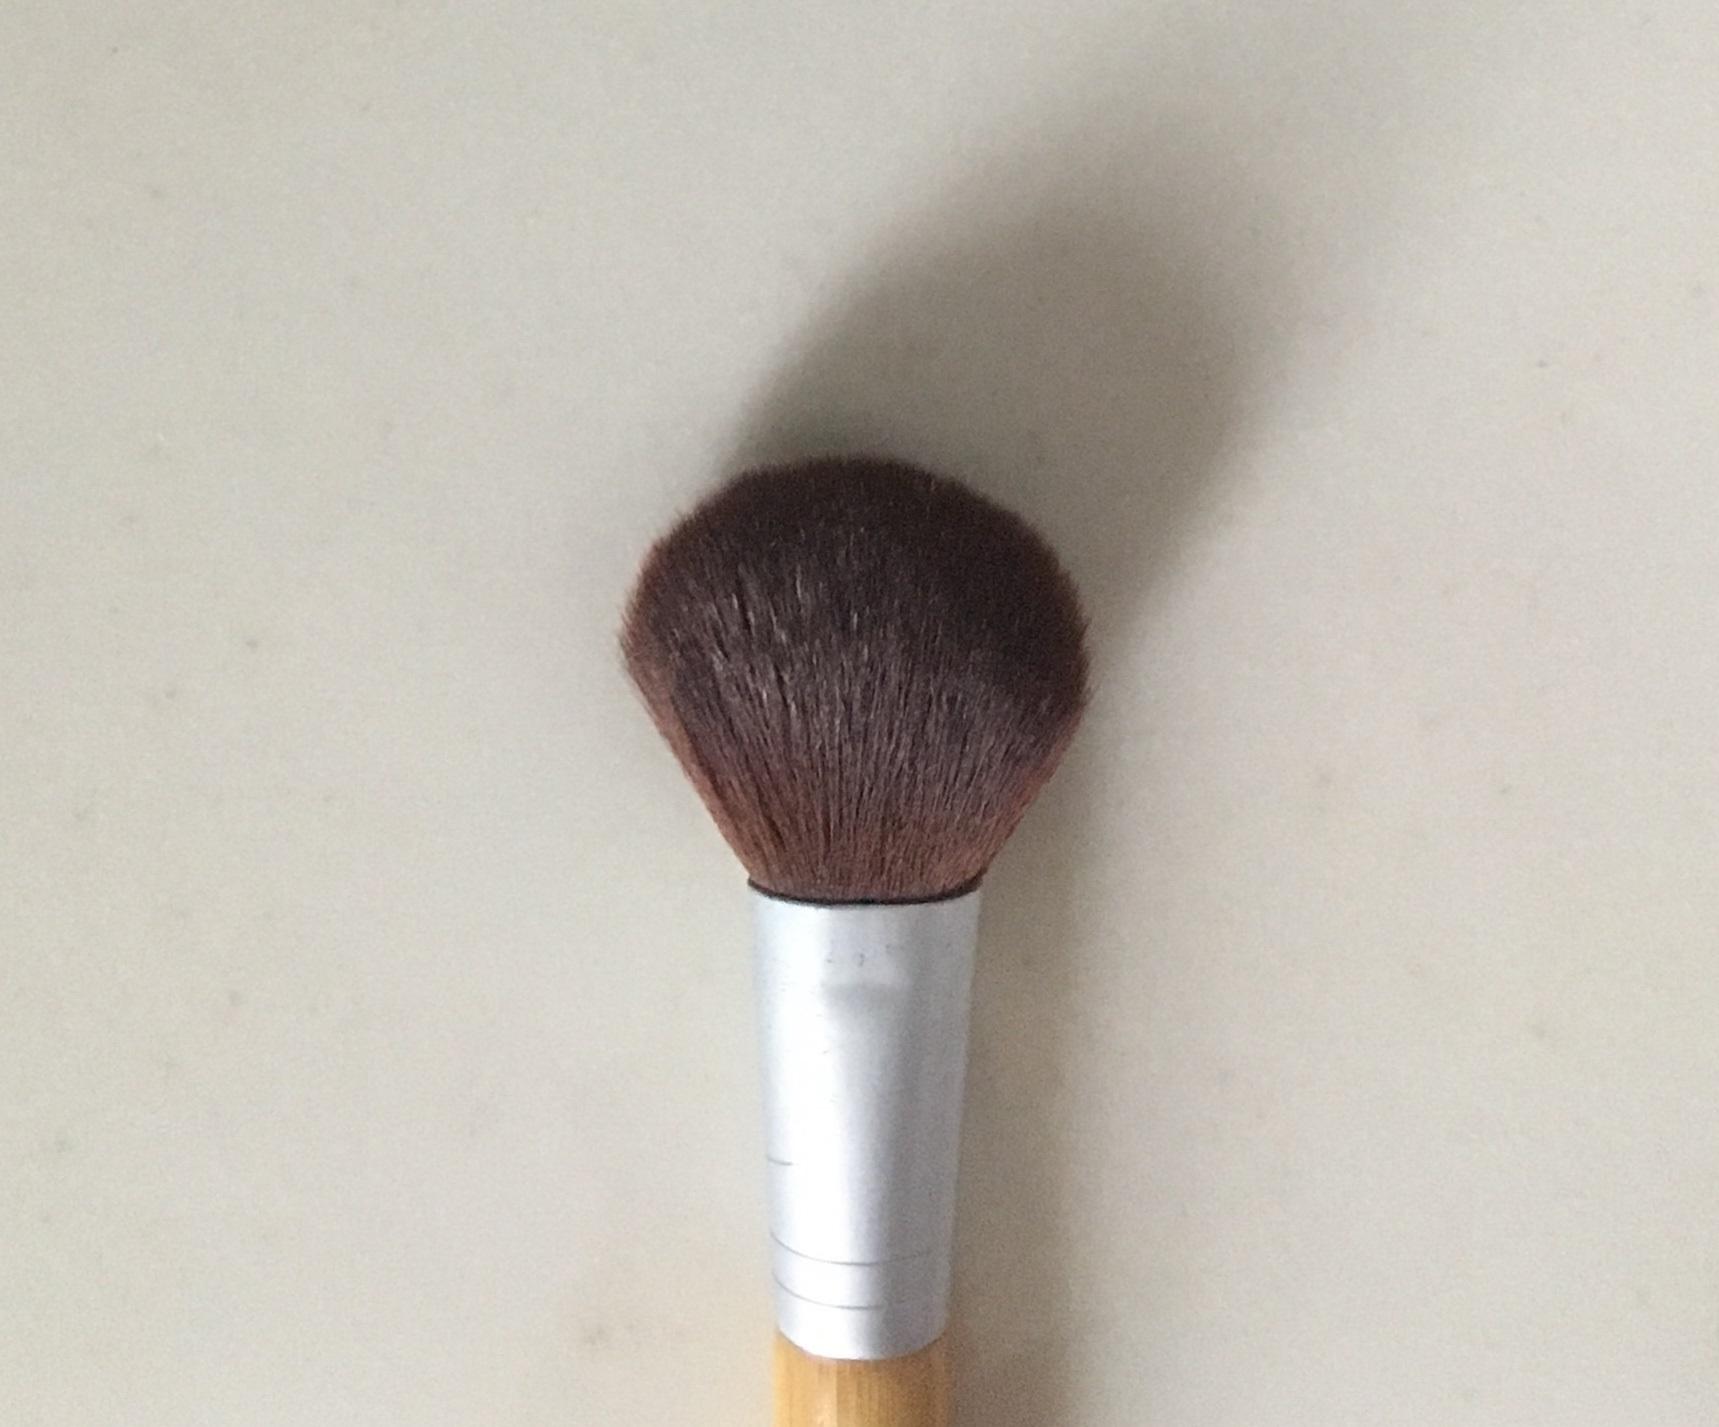 makeupthumb.jpg